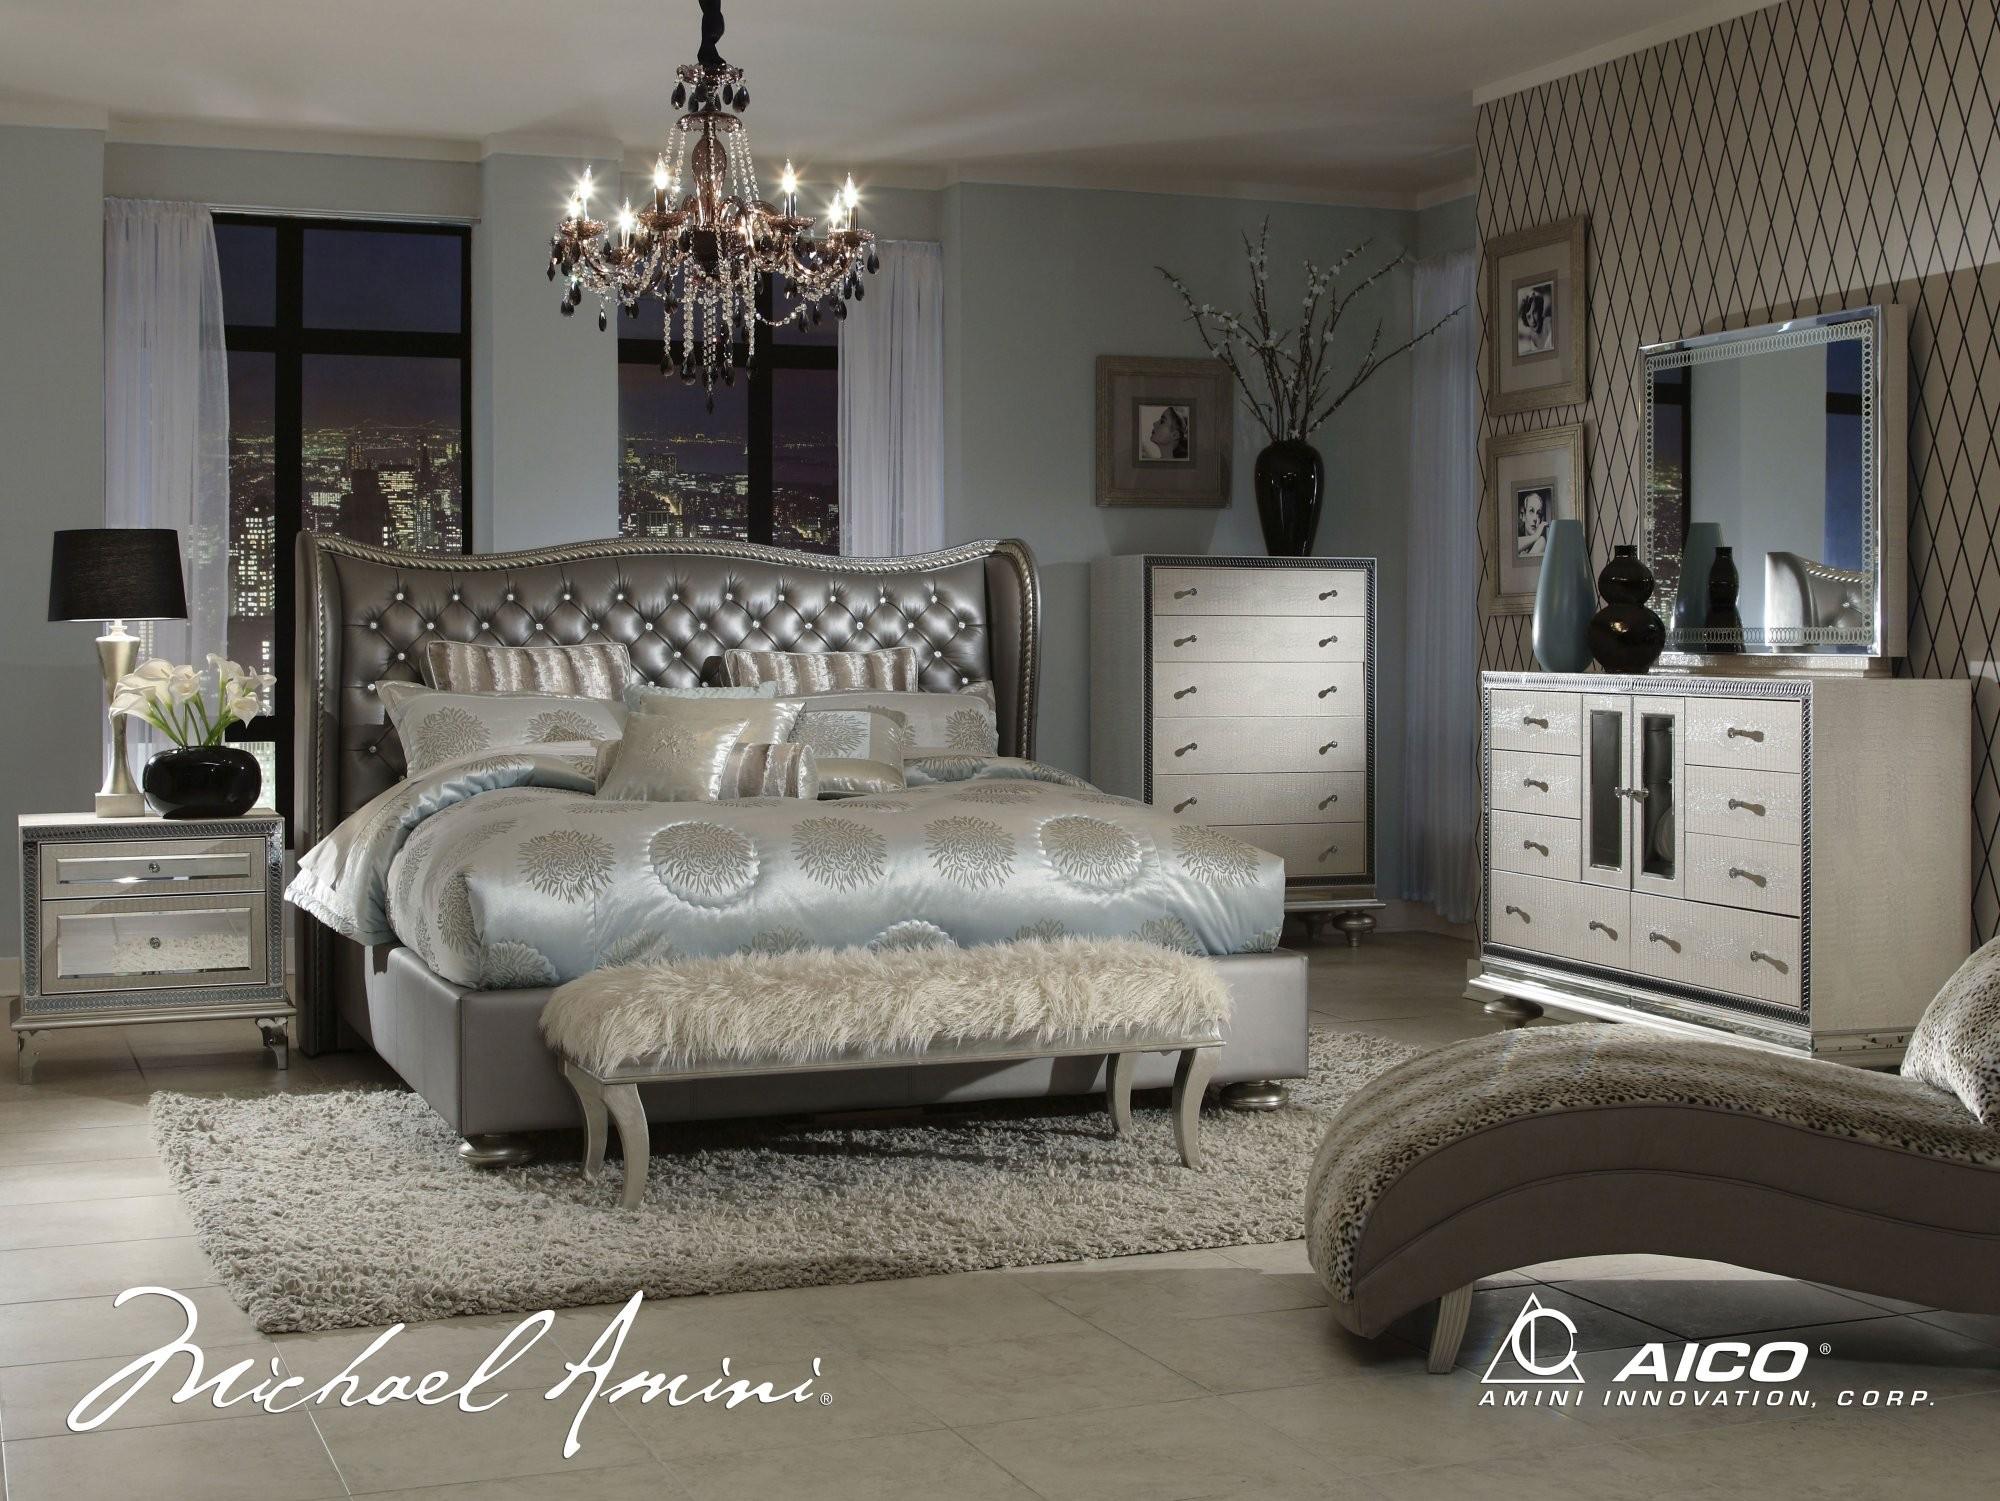 silver snow bedroom set photo - 9